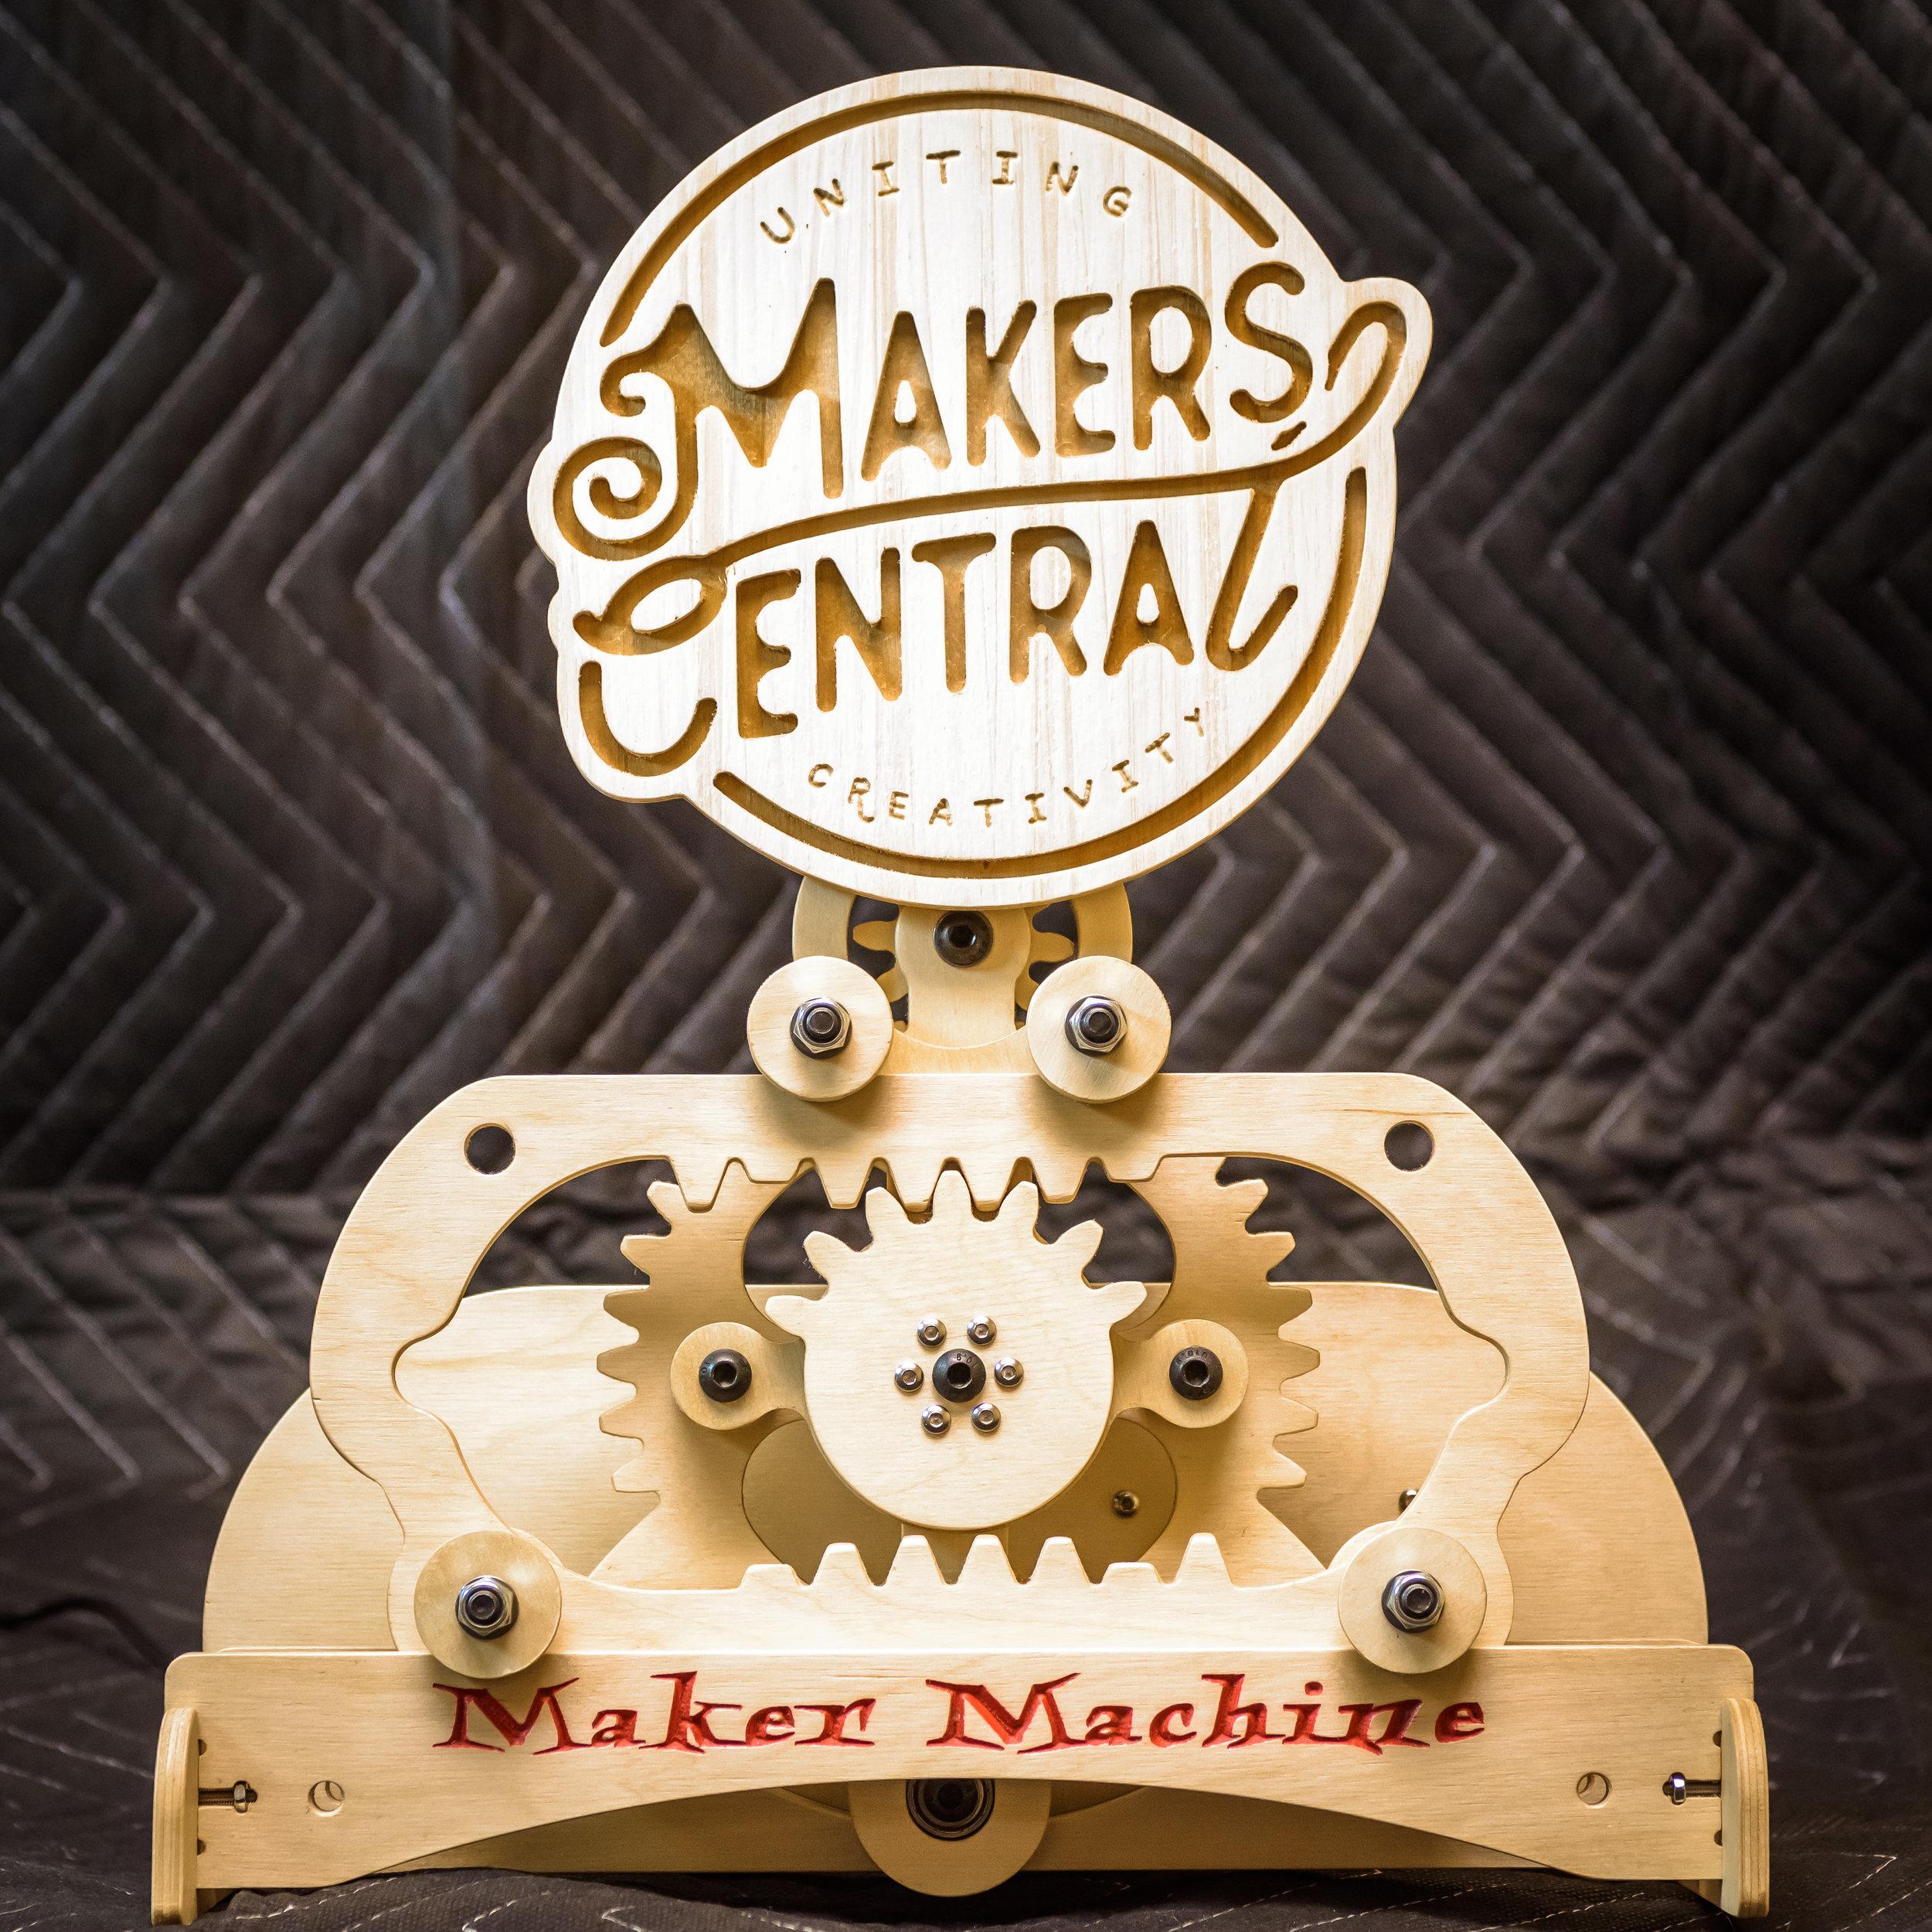 MAKER MACHINE v2-0546.jpg